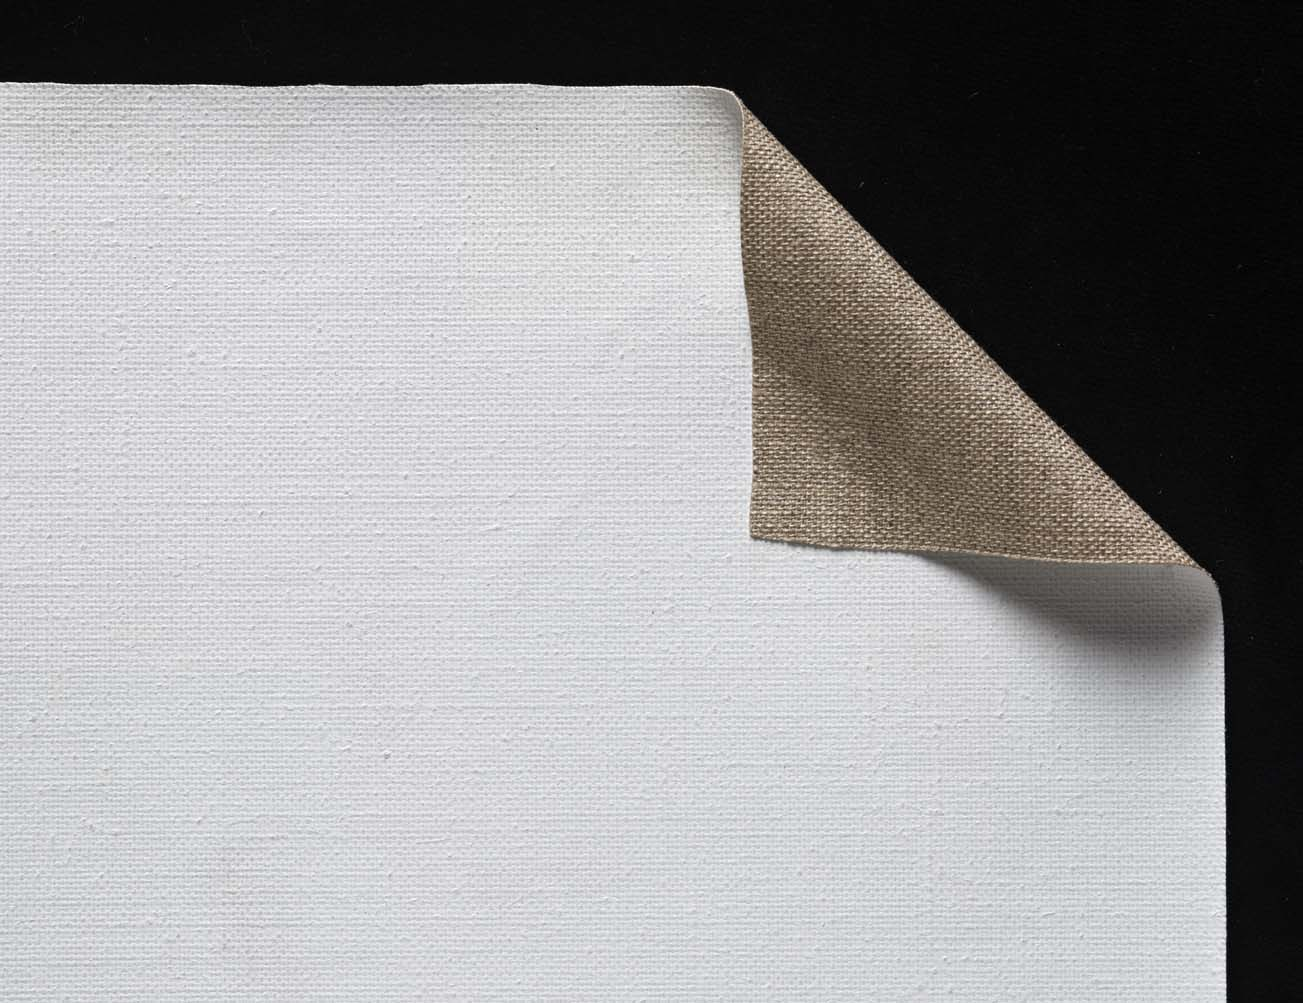 canvas 109 2 10 m canvas claessens artists 39 canvas. Black Bedroom Furniture Sets. Home Design Ideas